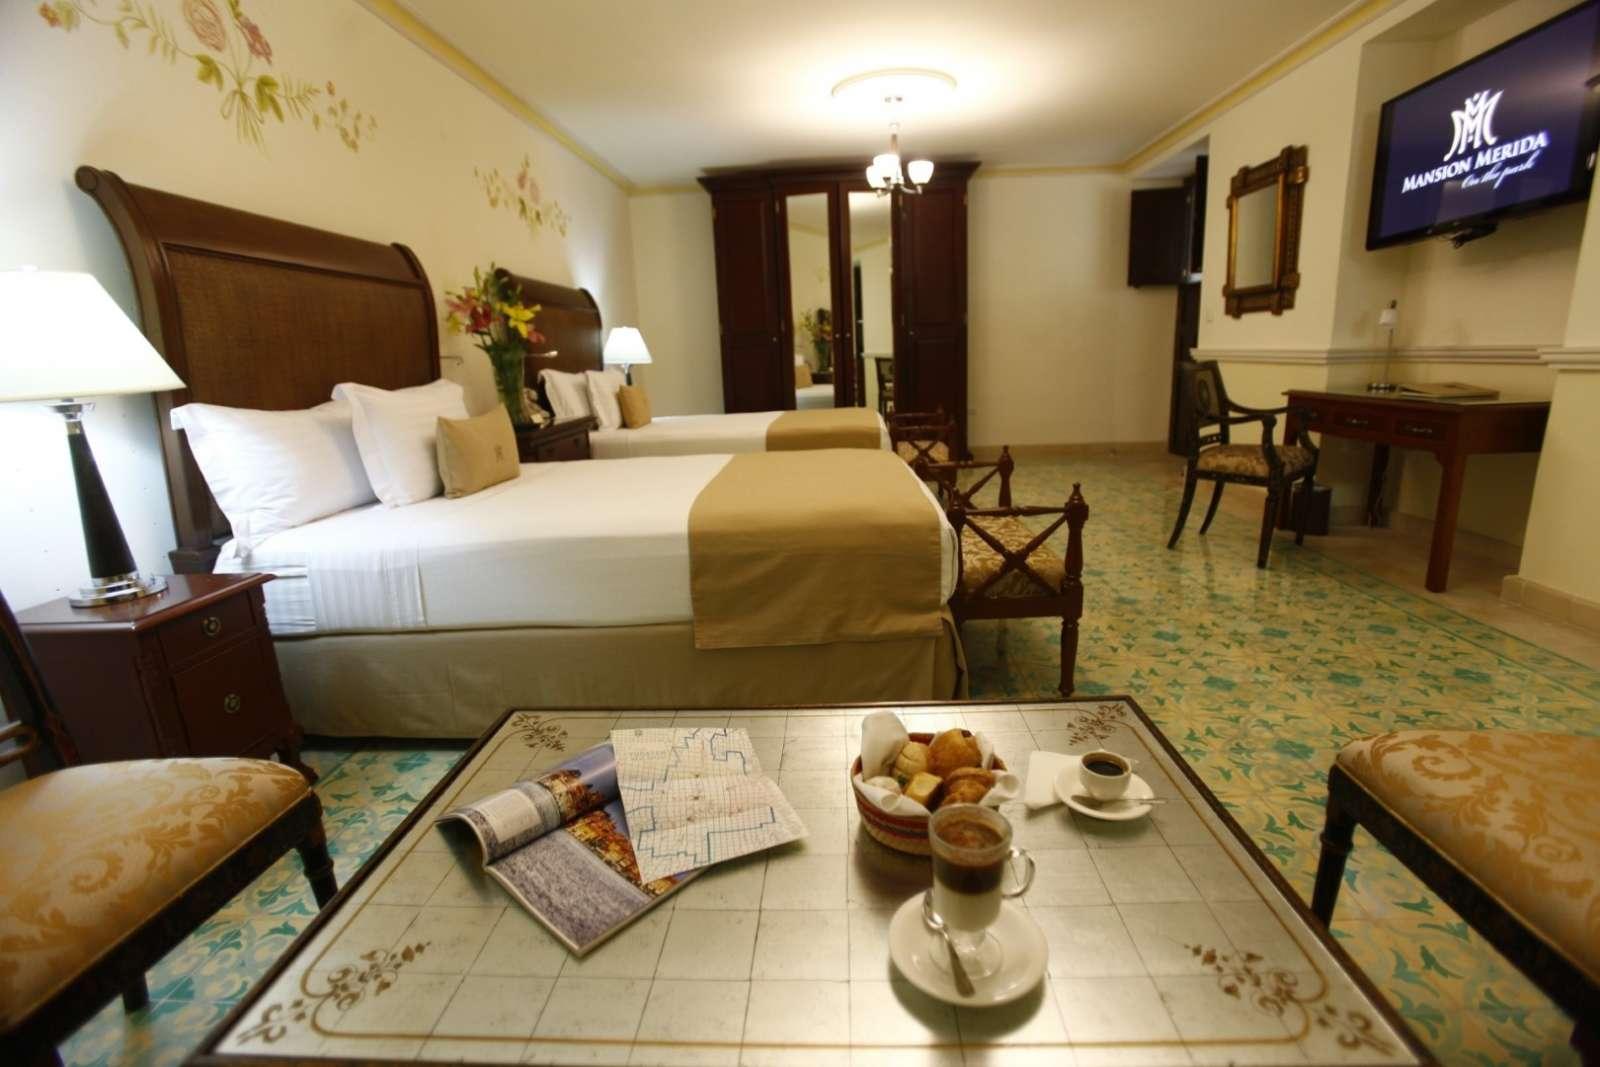 Twin room at hotel Mansion Merida